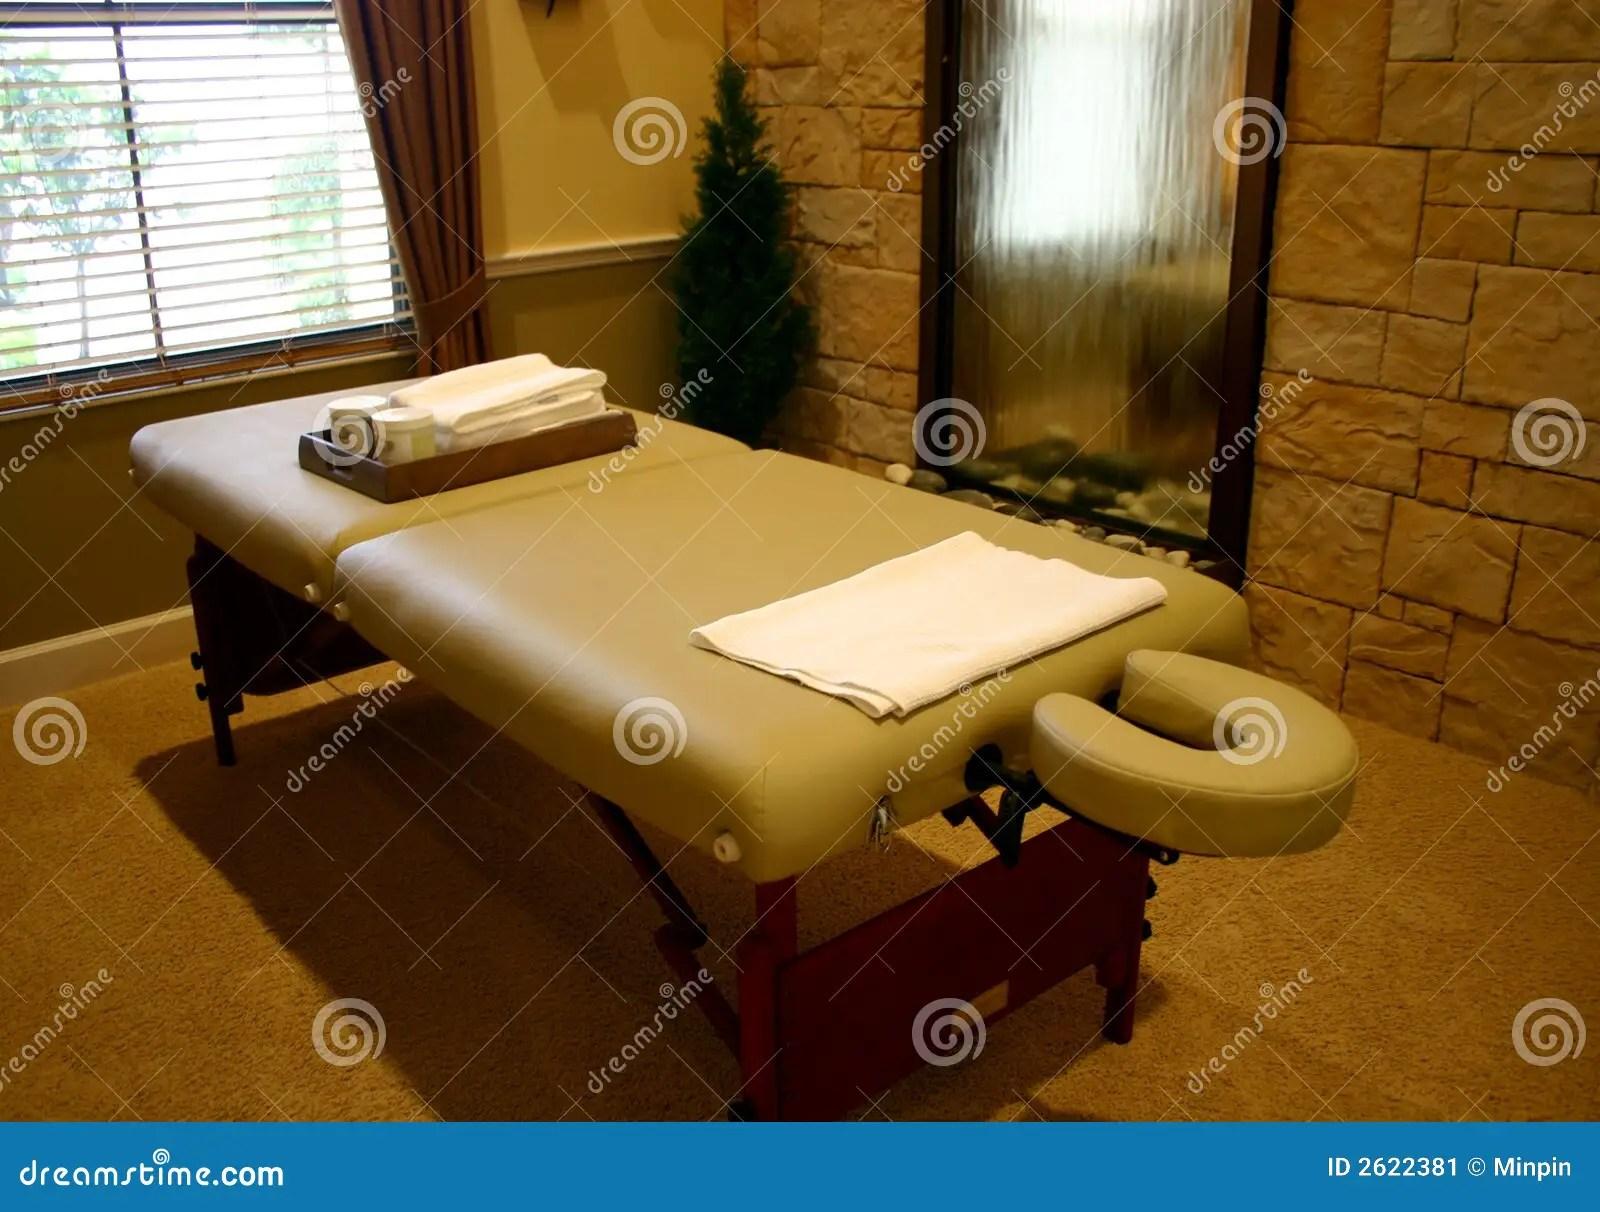 Massage Table Stock Image  Image 2622381